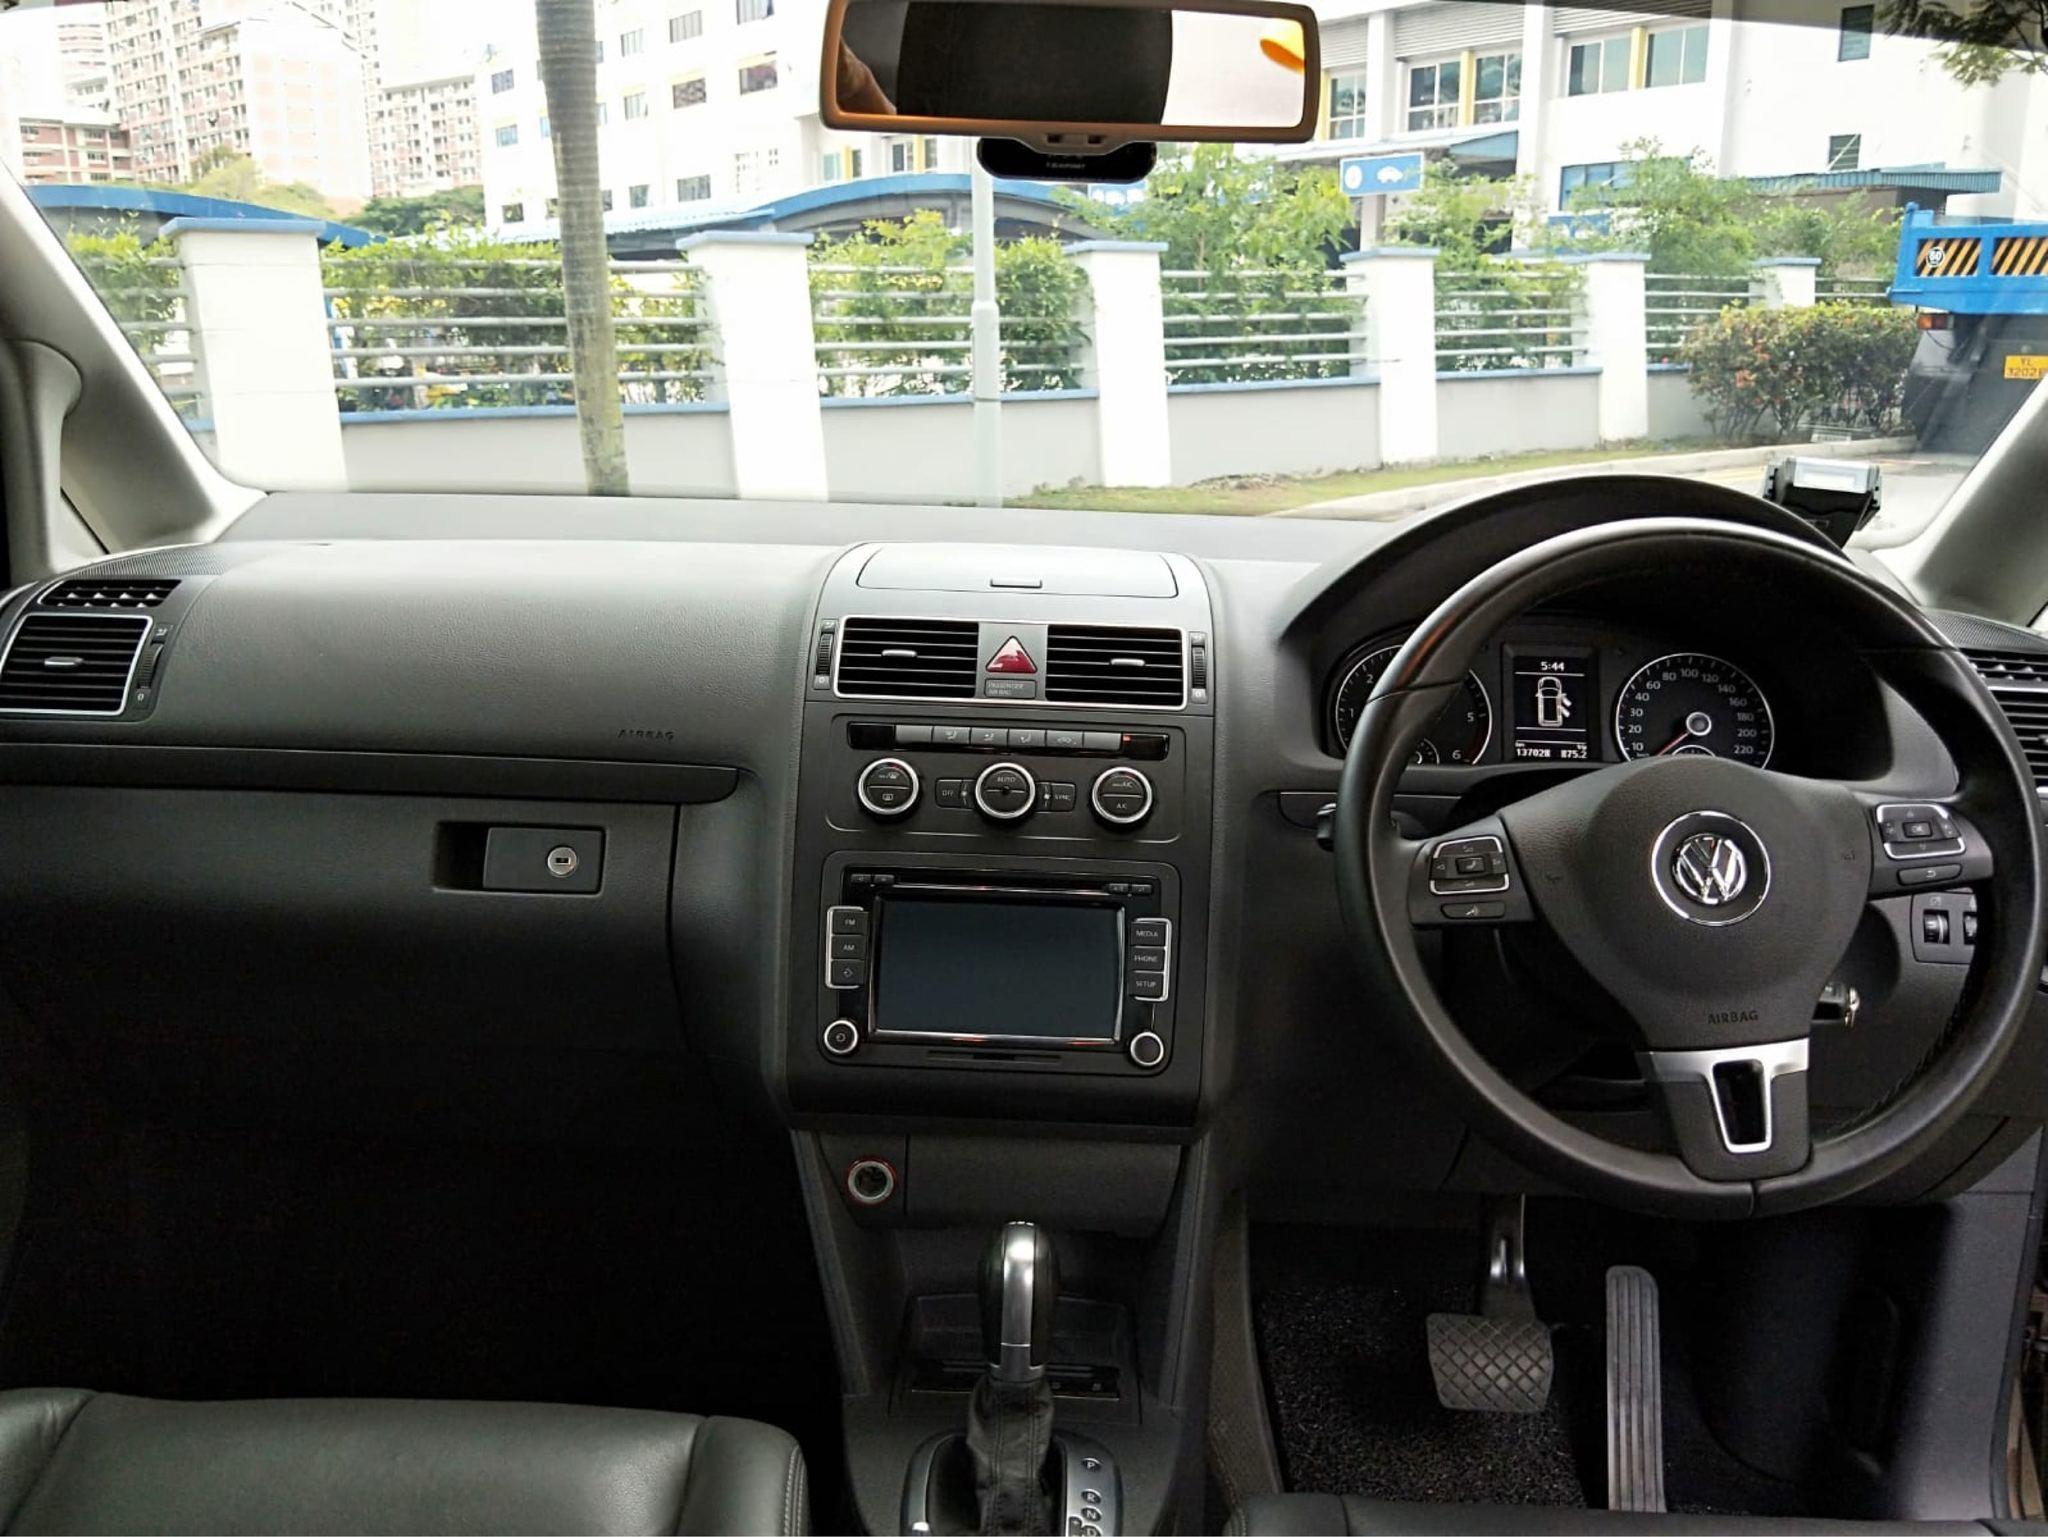 Volkswagen Touran 1.6 TDI Auto